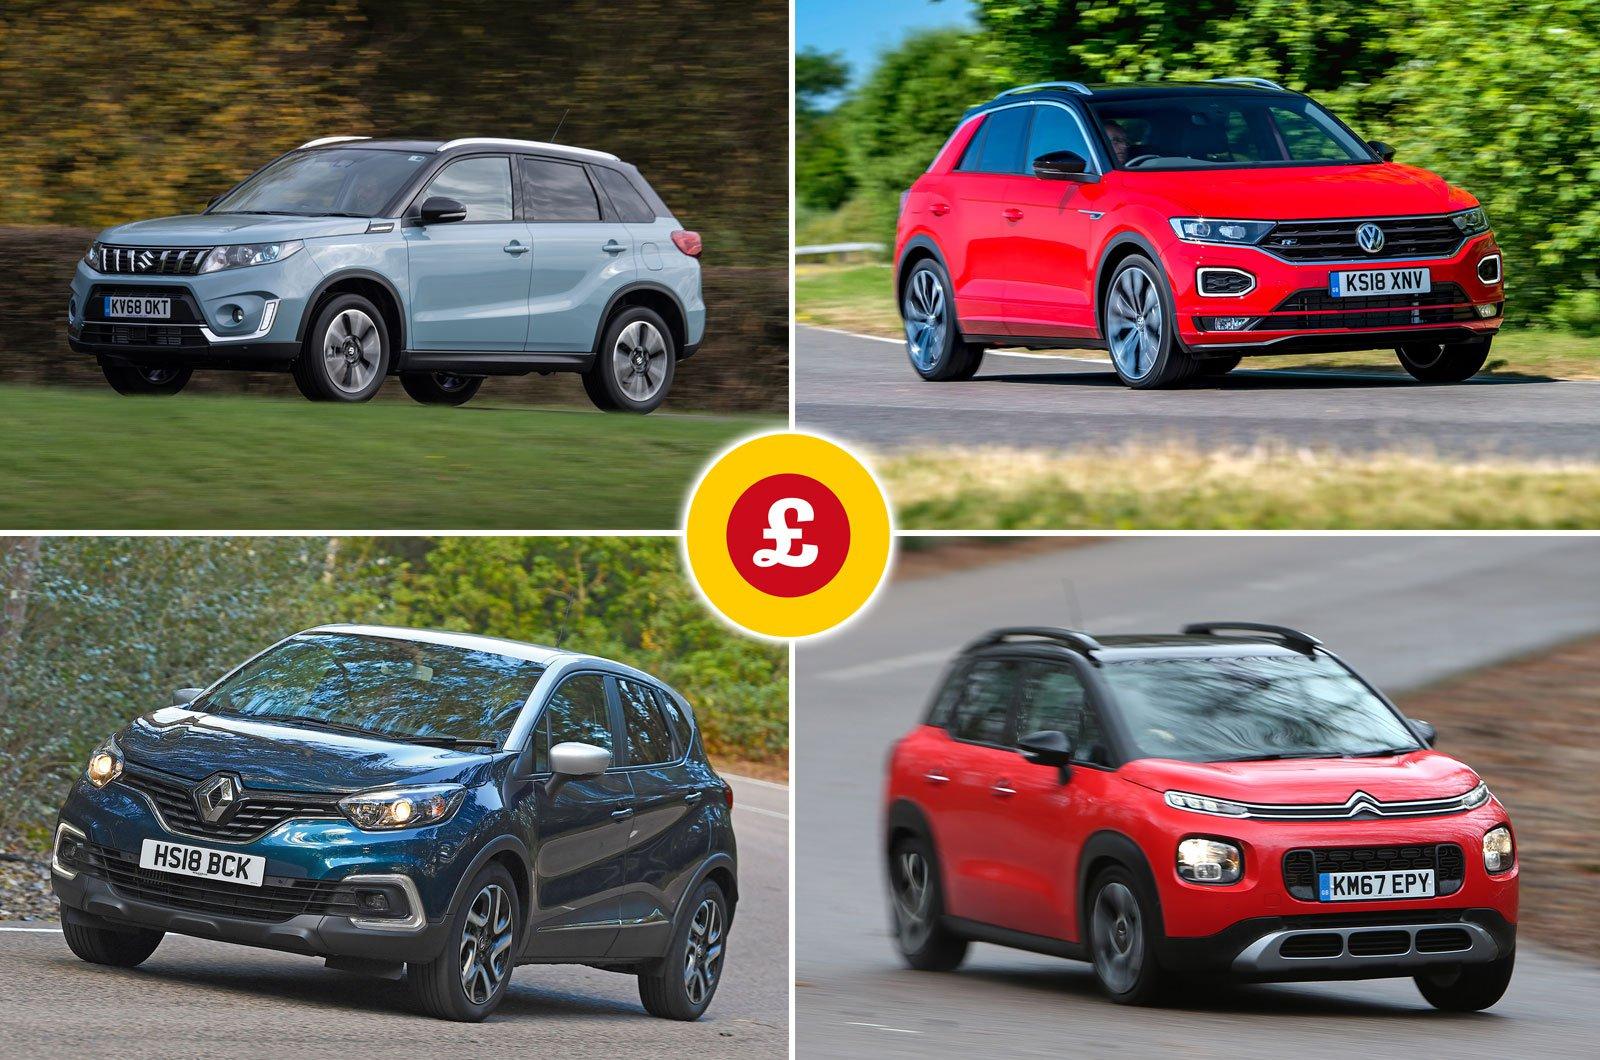 Suzuki Vitara, Volkswagen T-Roc, Renault Captur, Citroën C3 Aircross